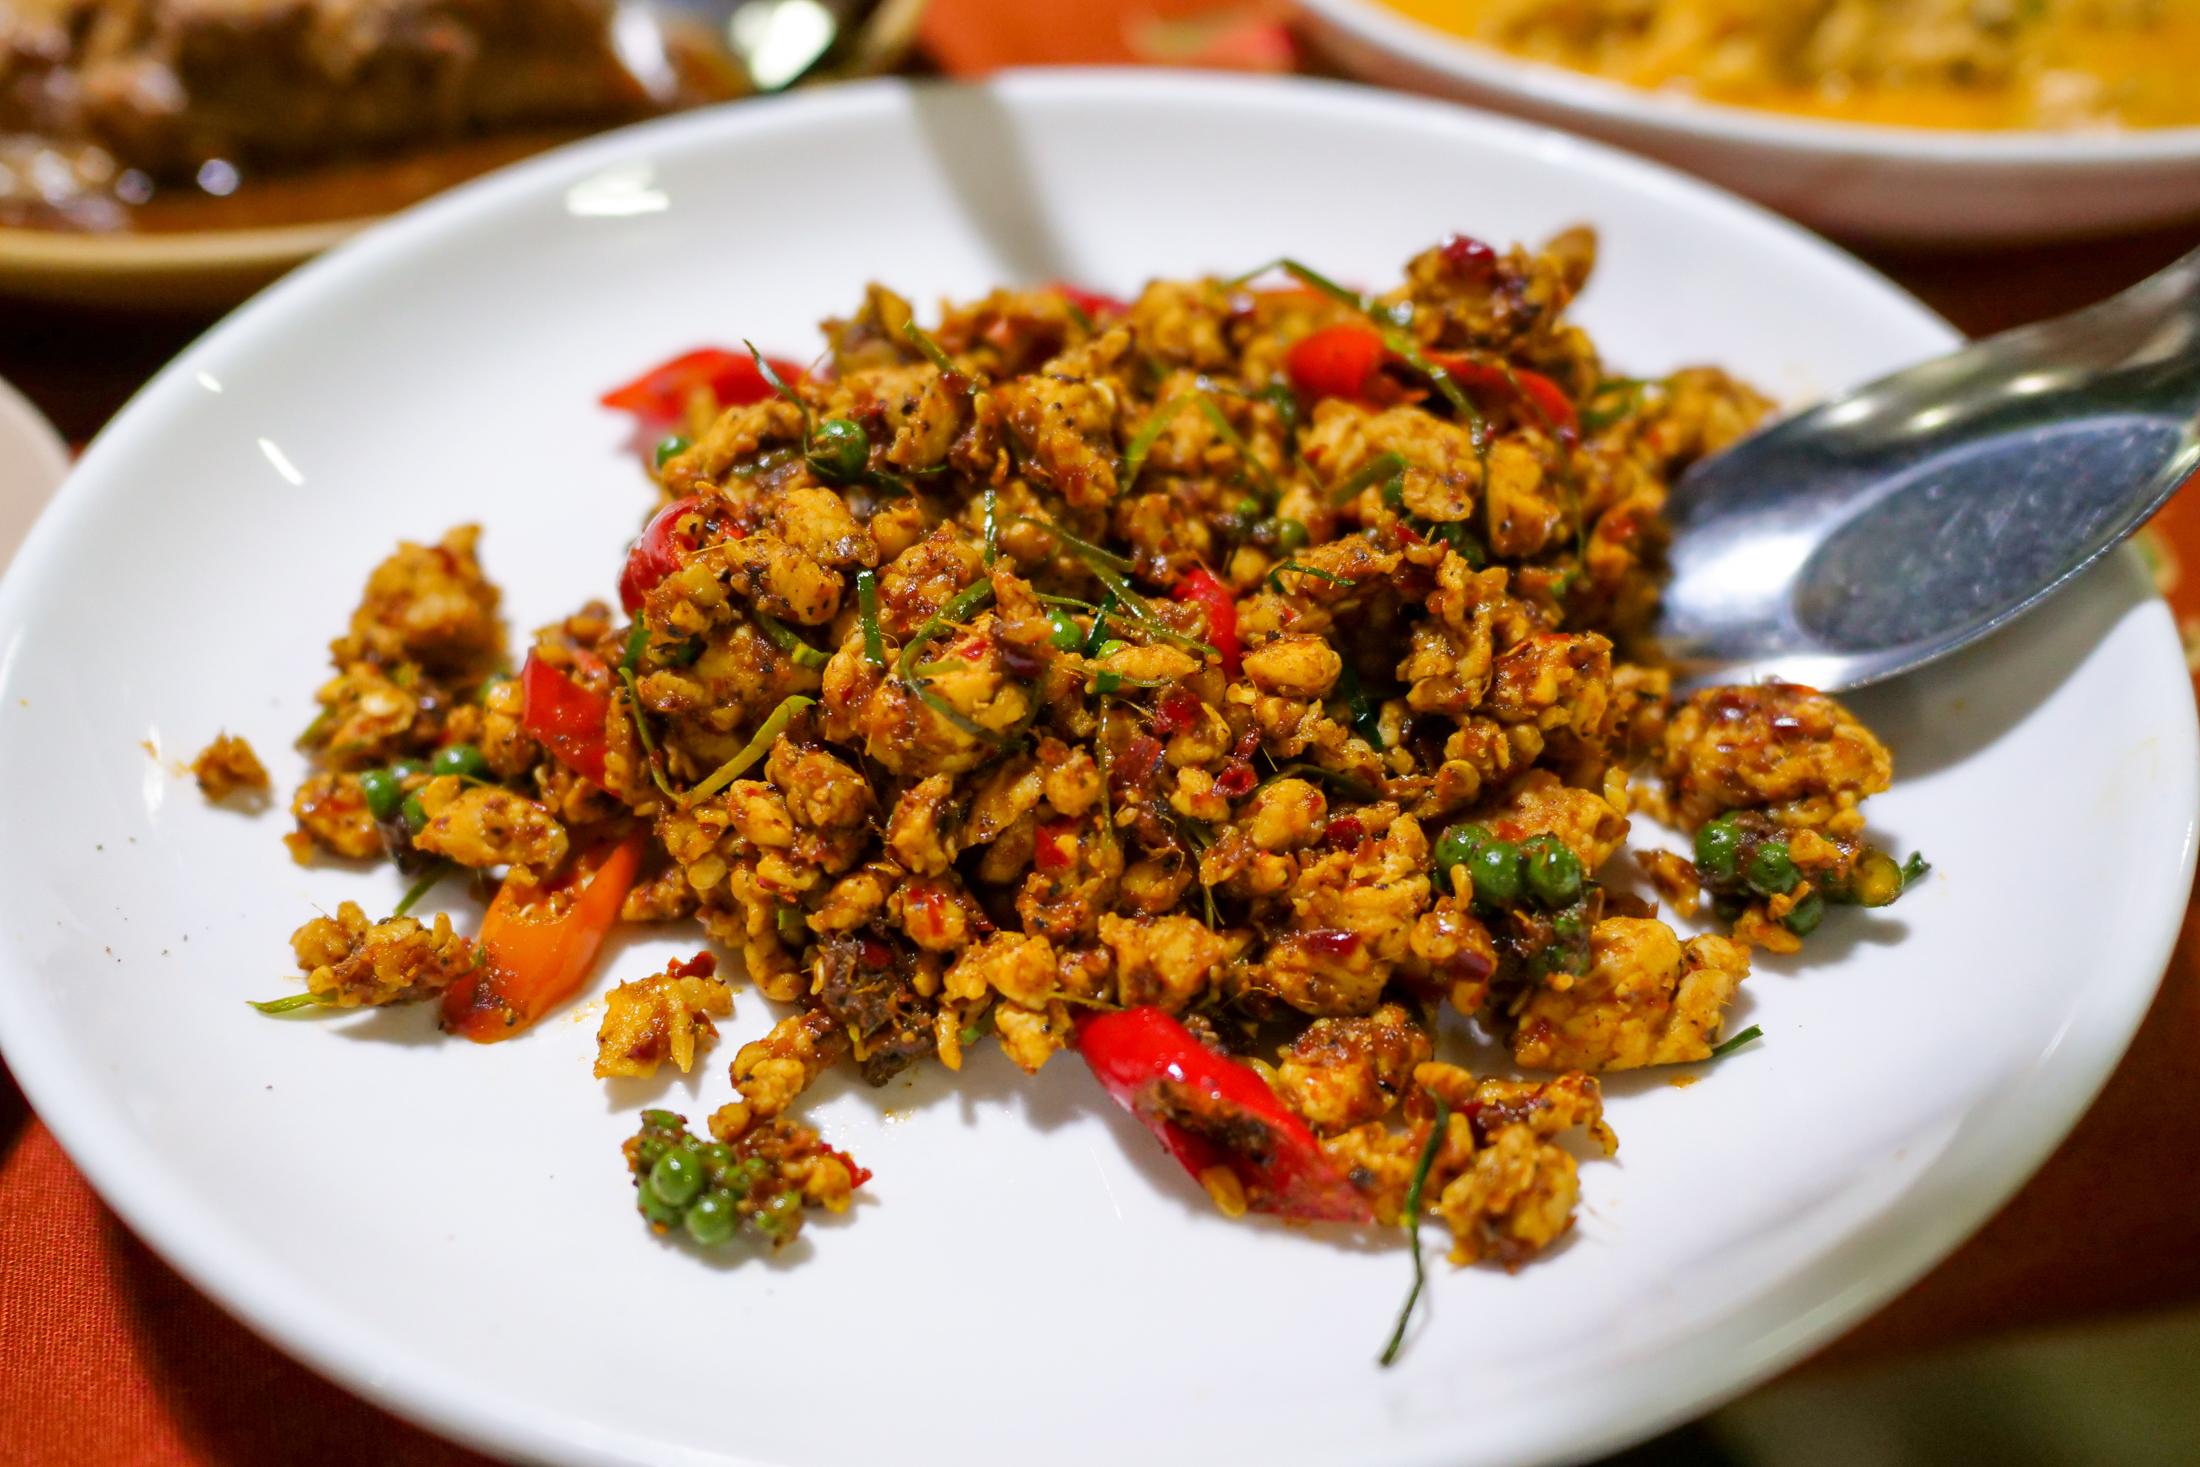 Nam Yoi Restaurant (ร้านอาหารน้ำย้อย)